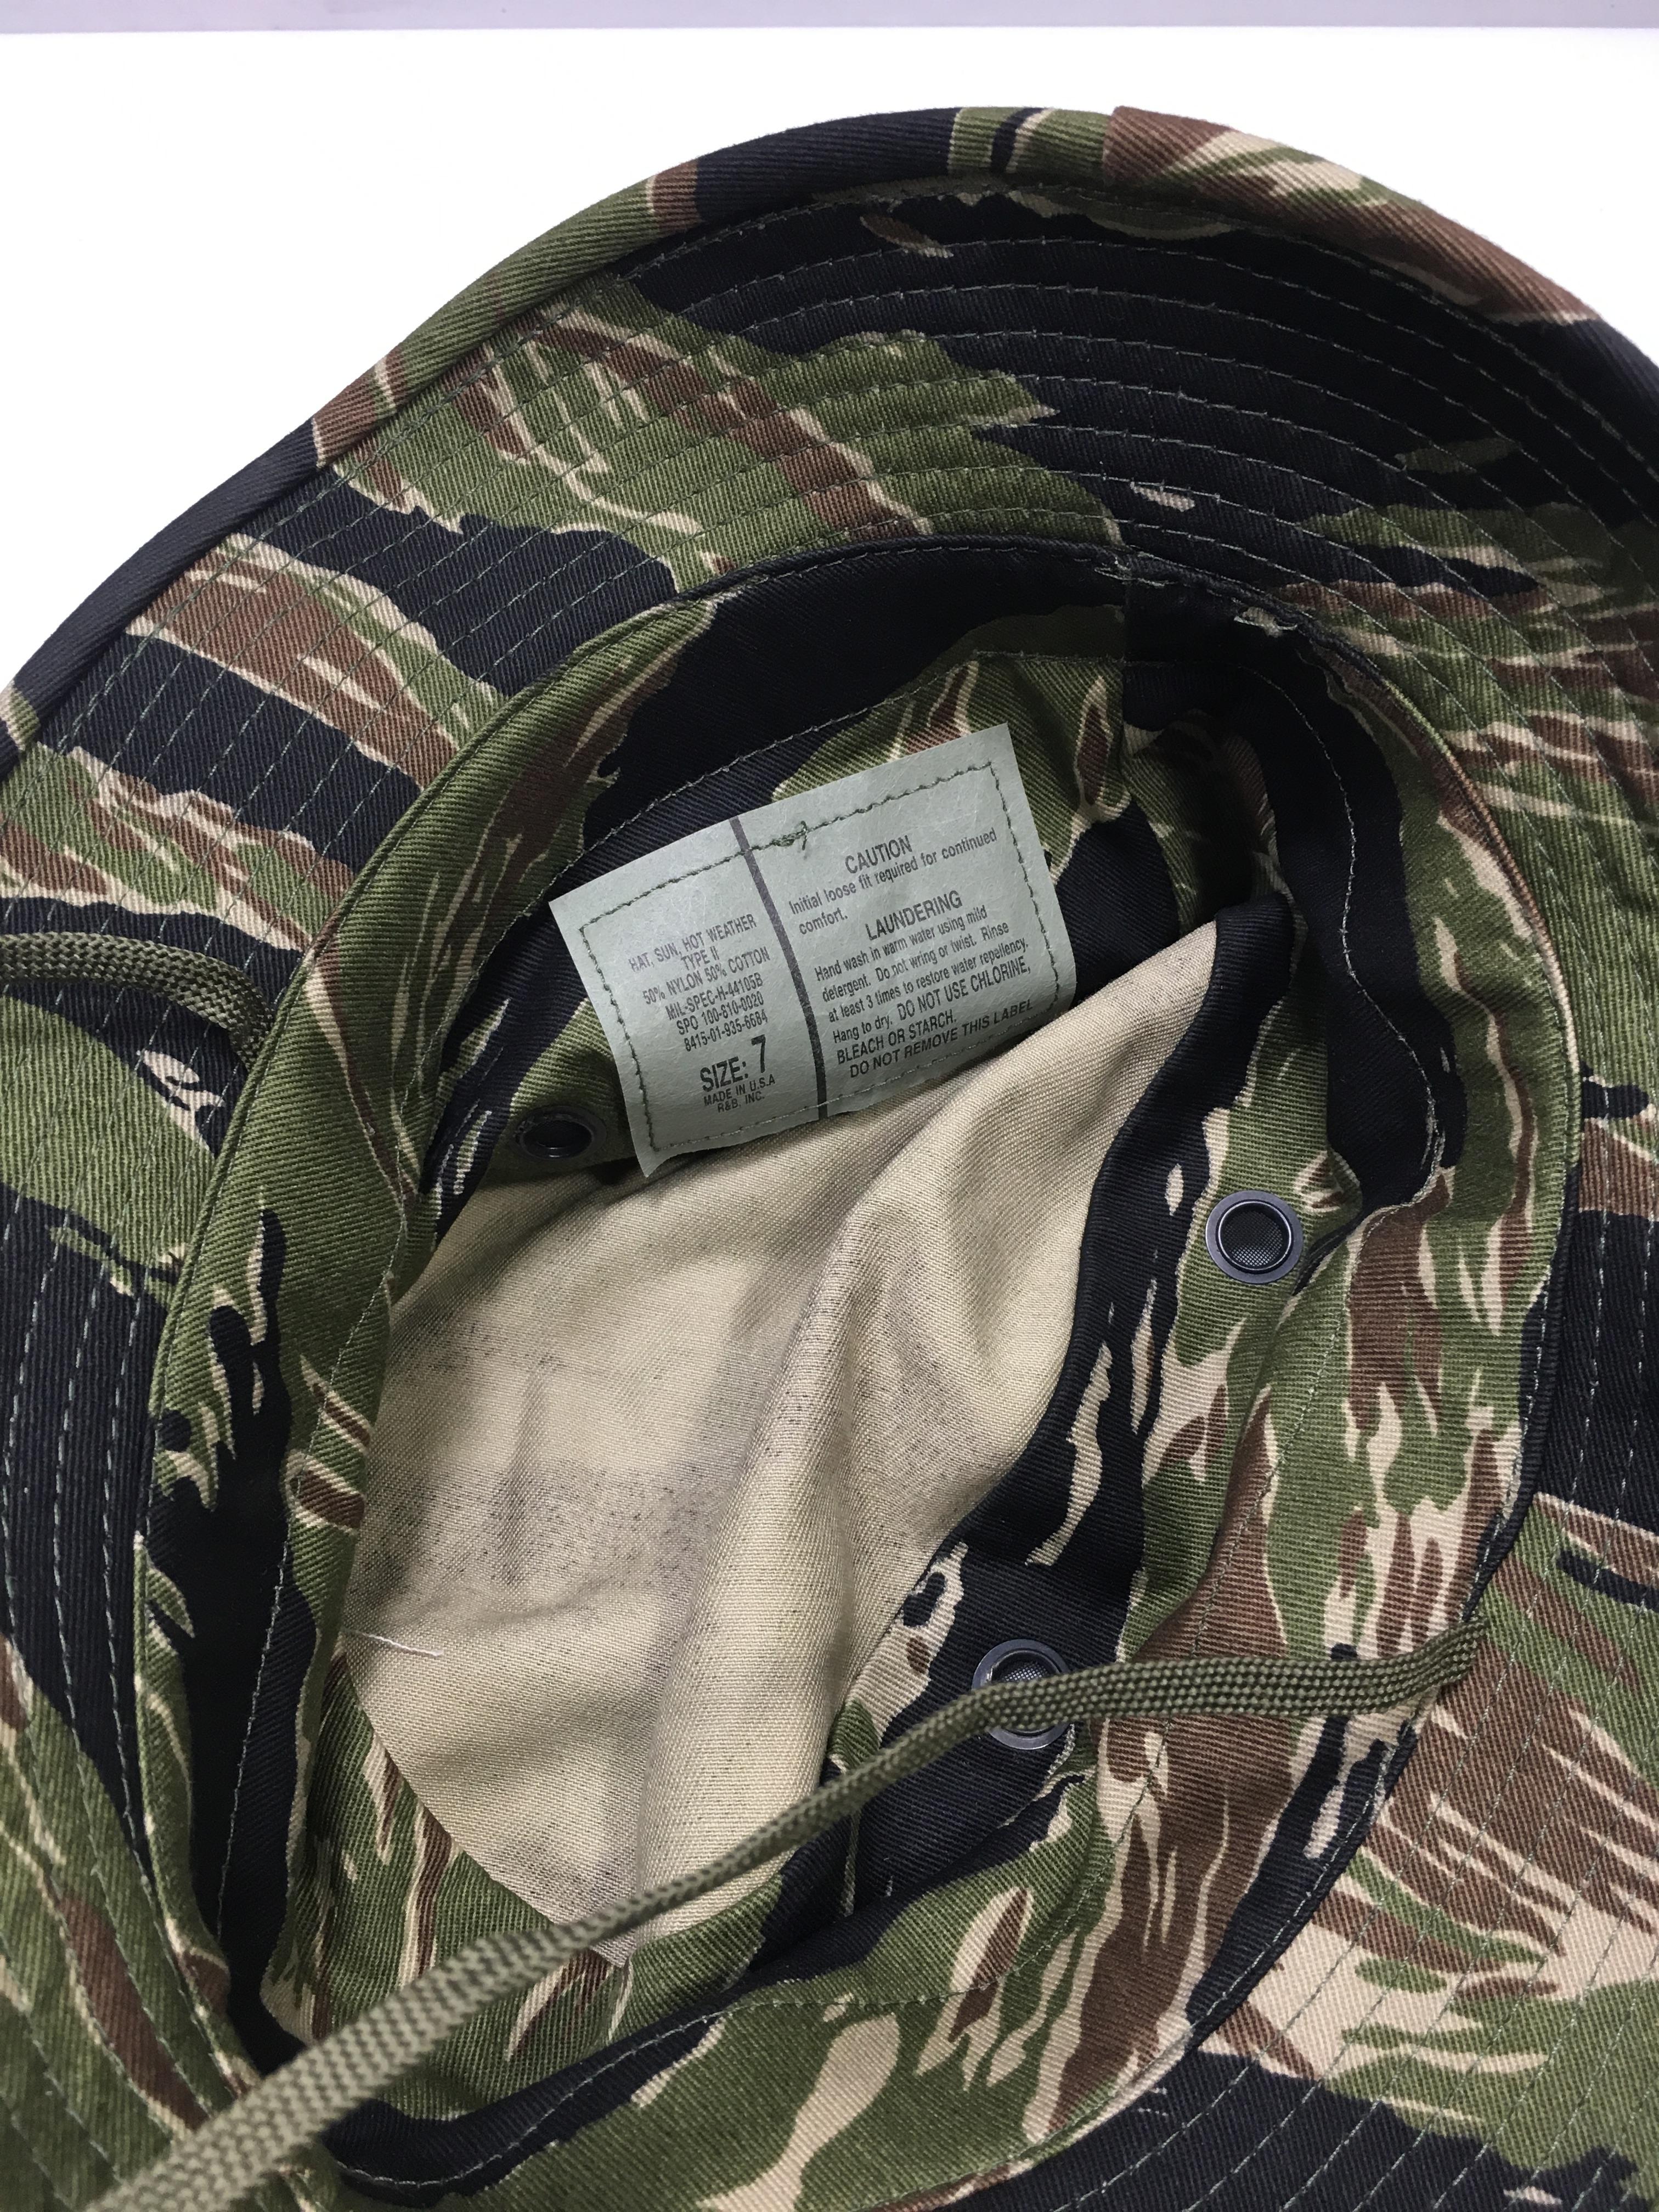 tigerstripe boonie hat a65d1ed62e0a